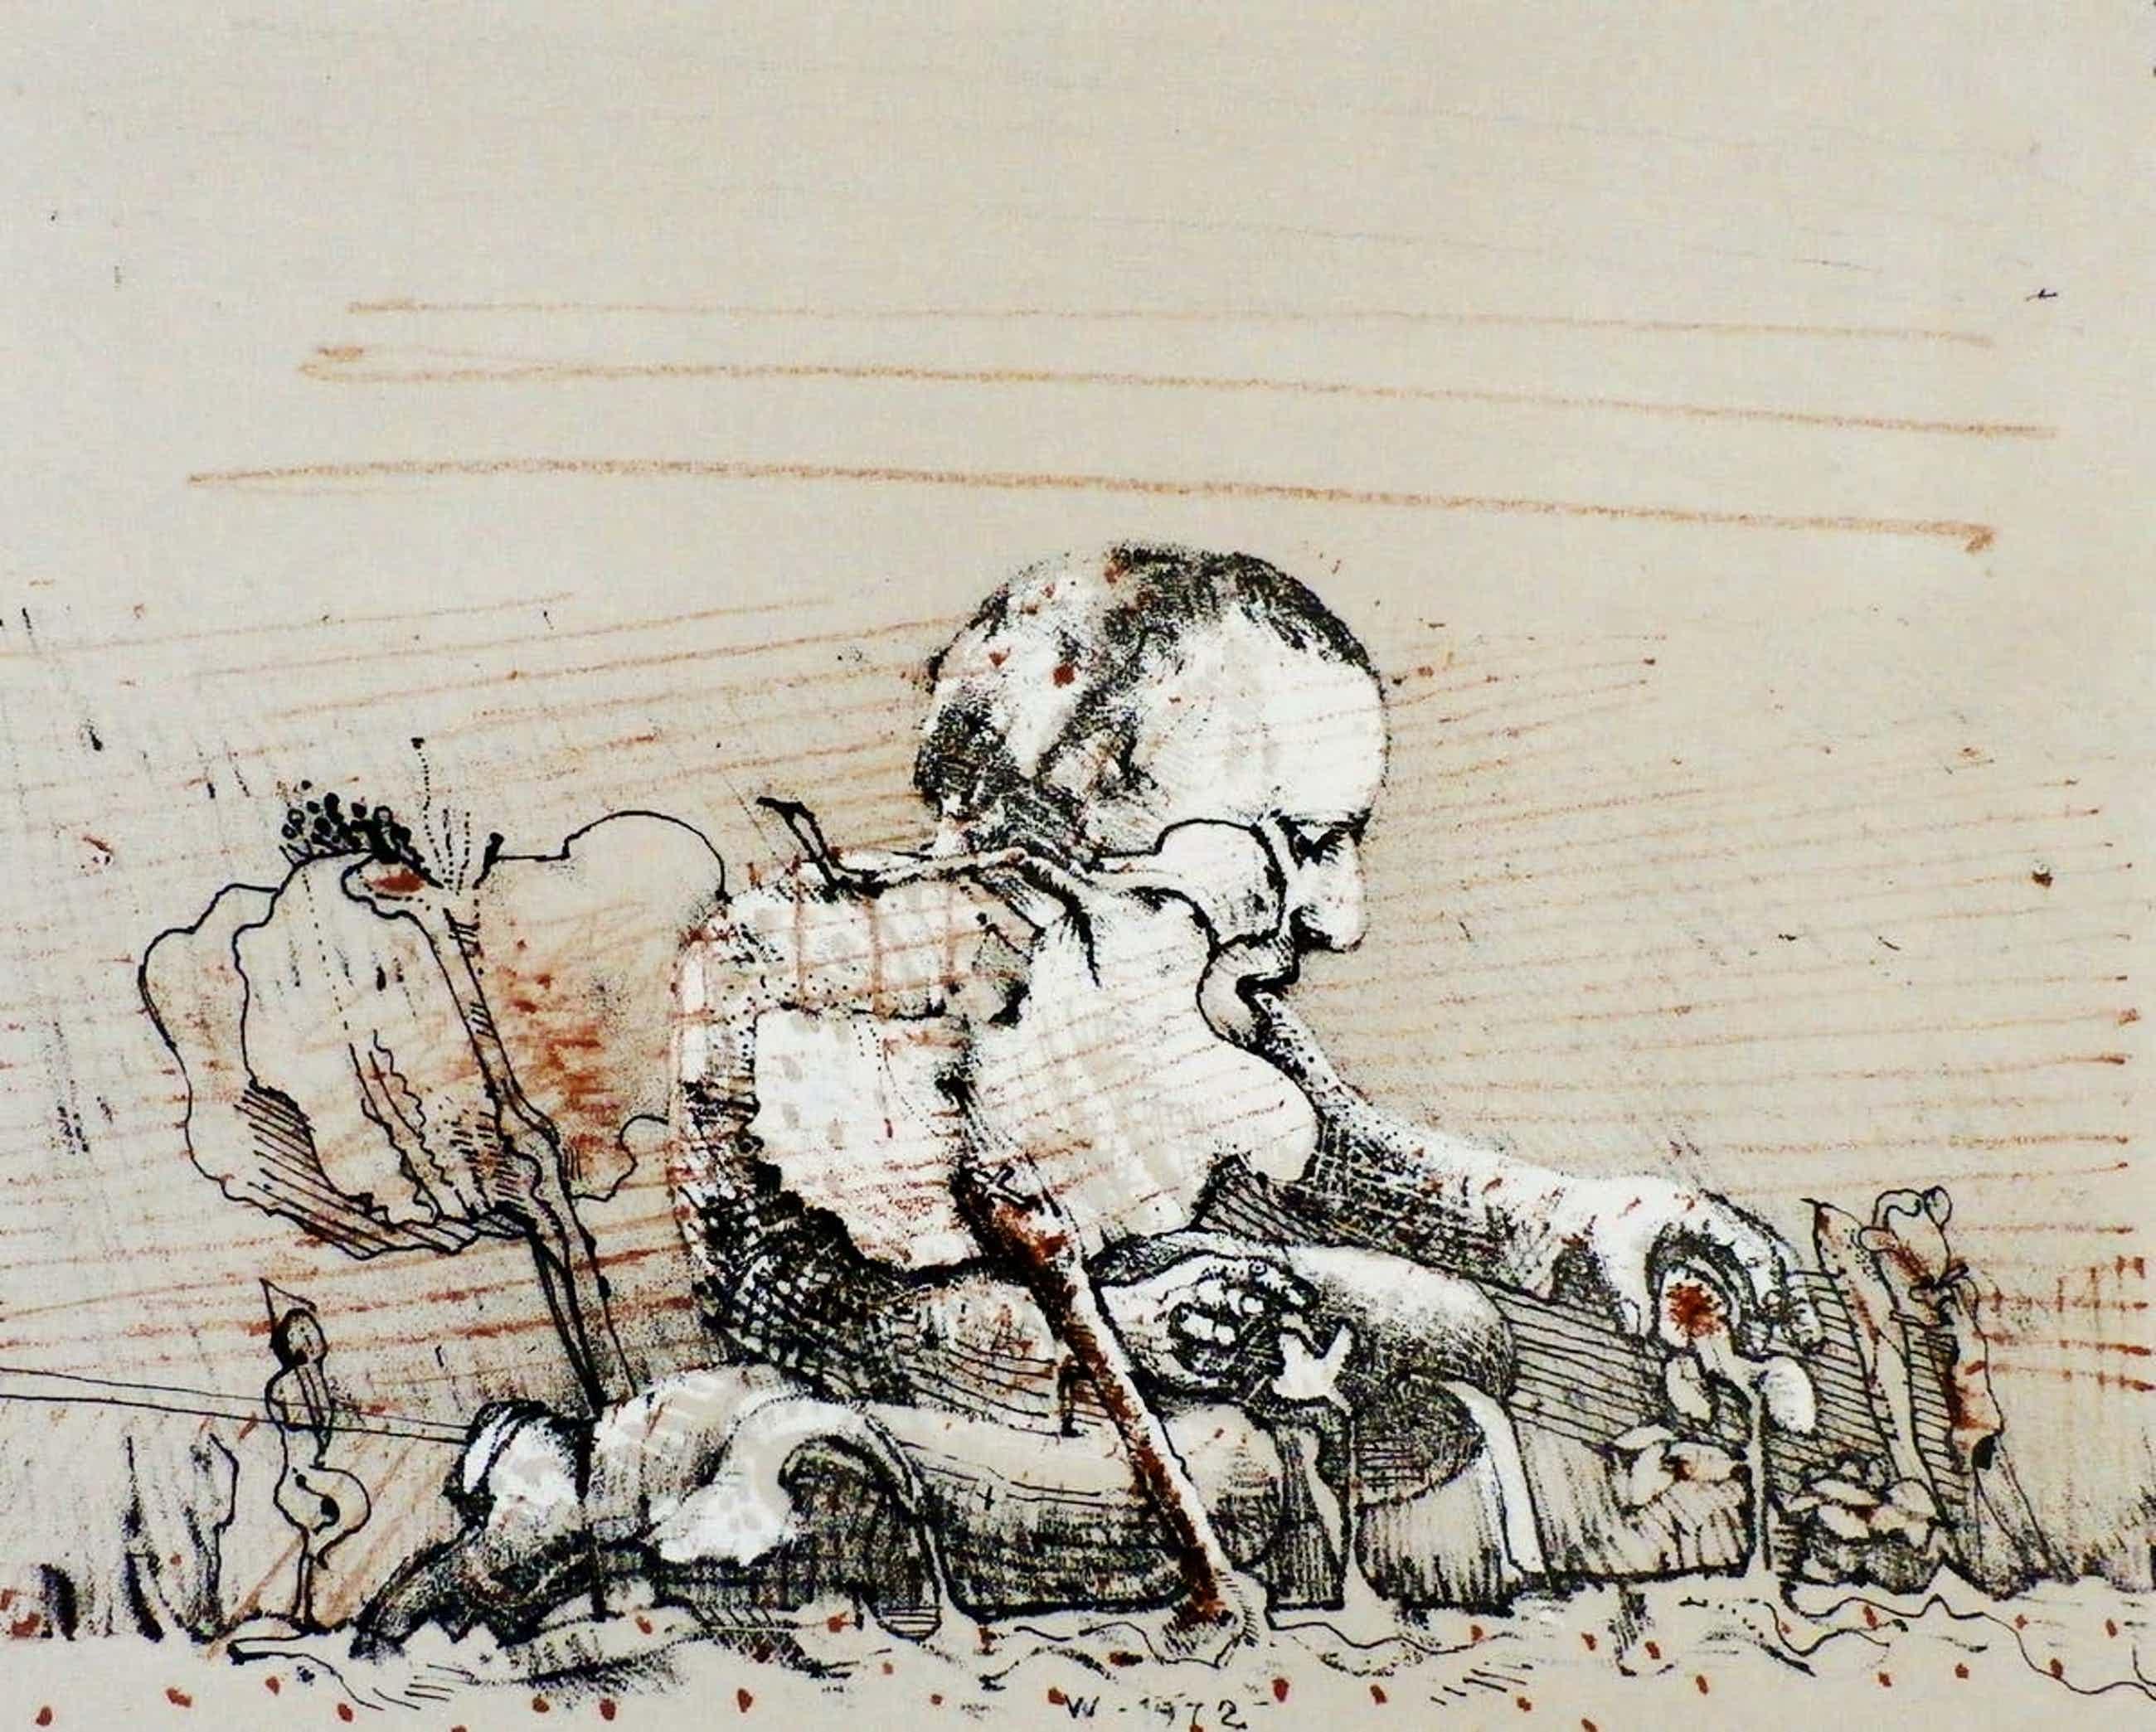 Co Westerik - litho: aardbei plukkende man - 1972 kopen? Bied vanaf 250!